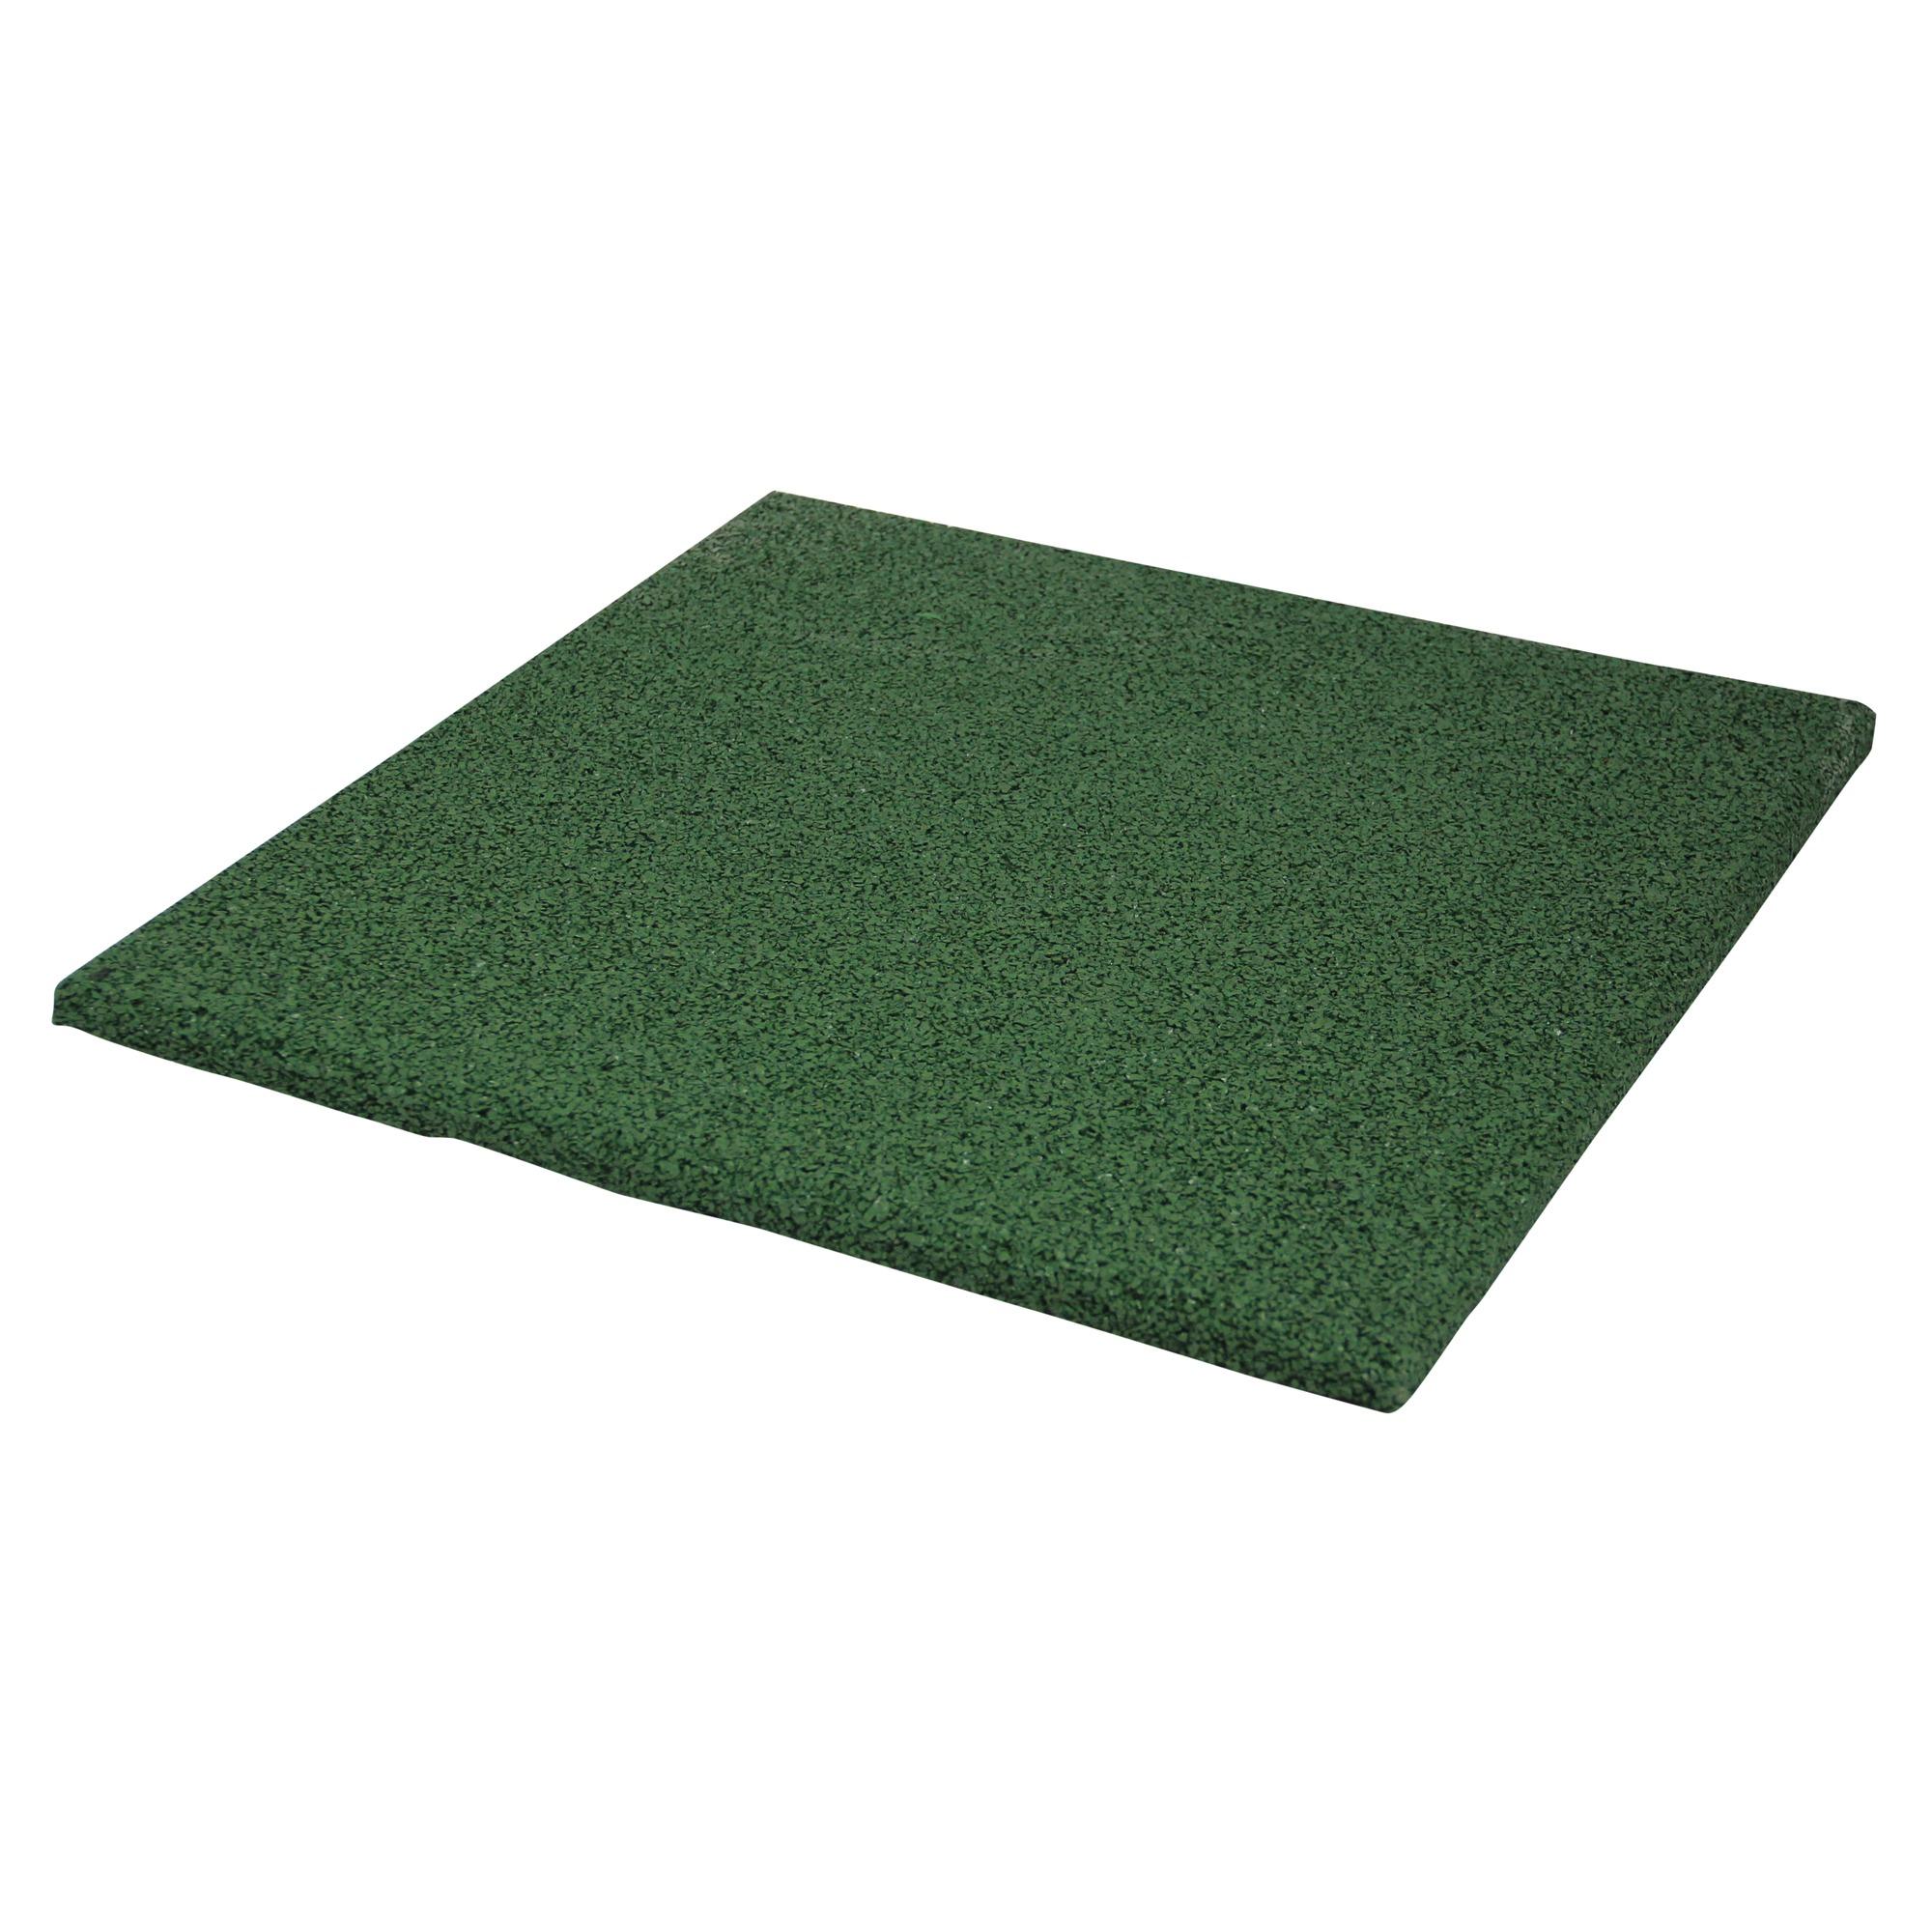 Terrastegel Rubber Groen 40x40 cm - 240 Tegels - 38,40 m2